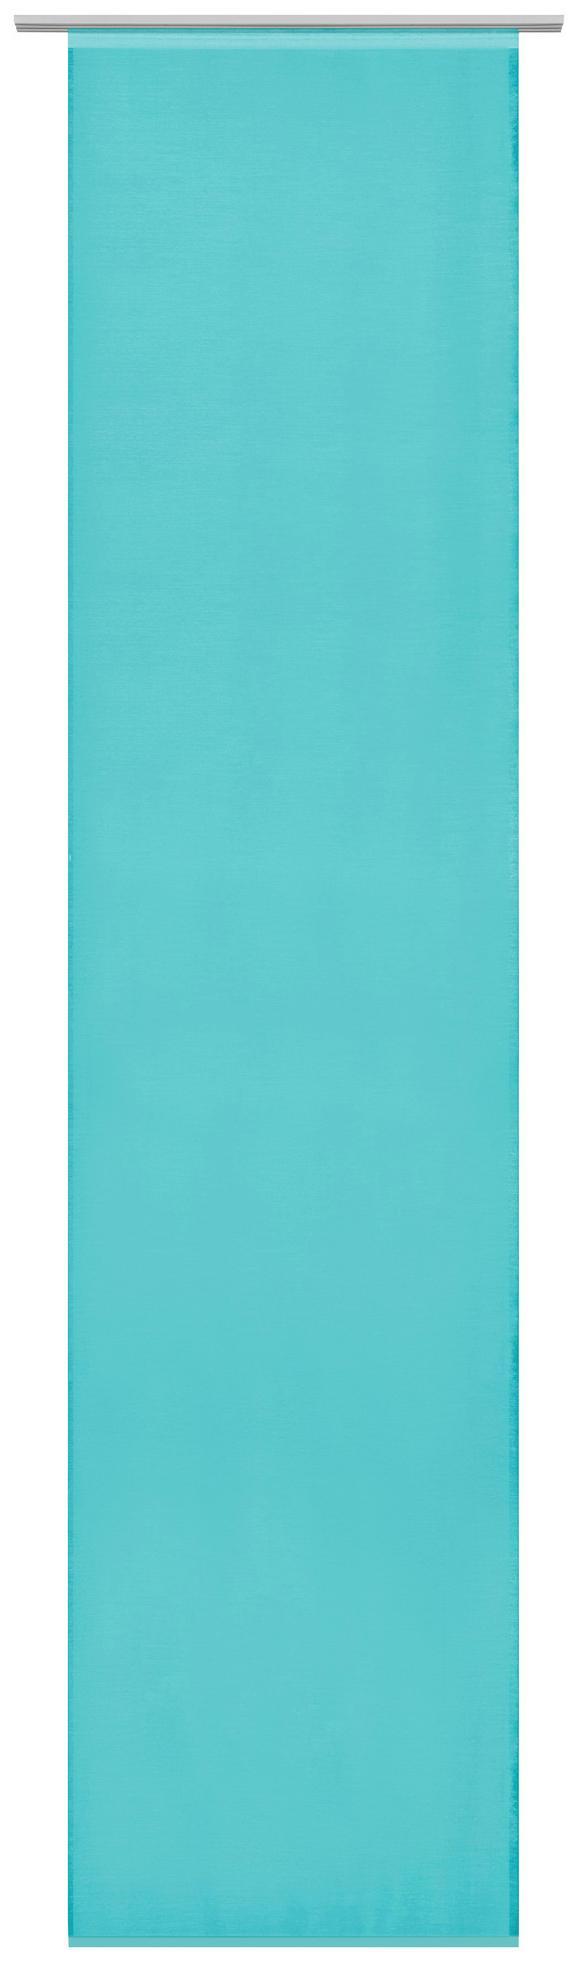 Flächenvorhang Uni in Petrol, ca. 60x245cm - Petrol, MODERN, Textil (60/245cm) - Mömax modern living